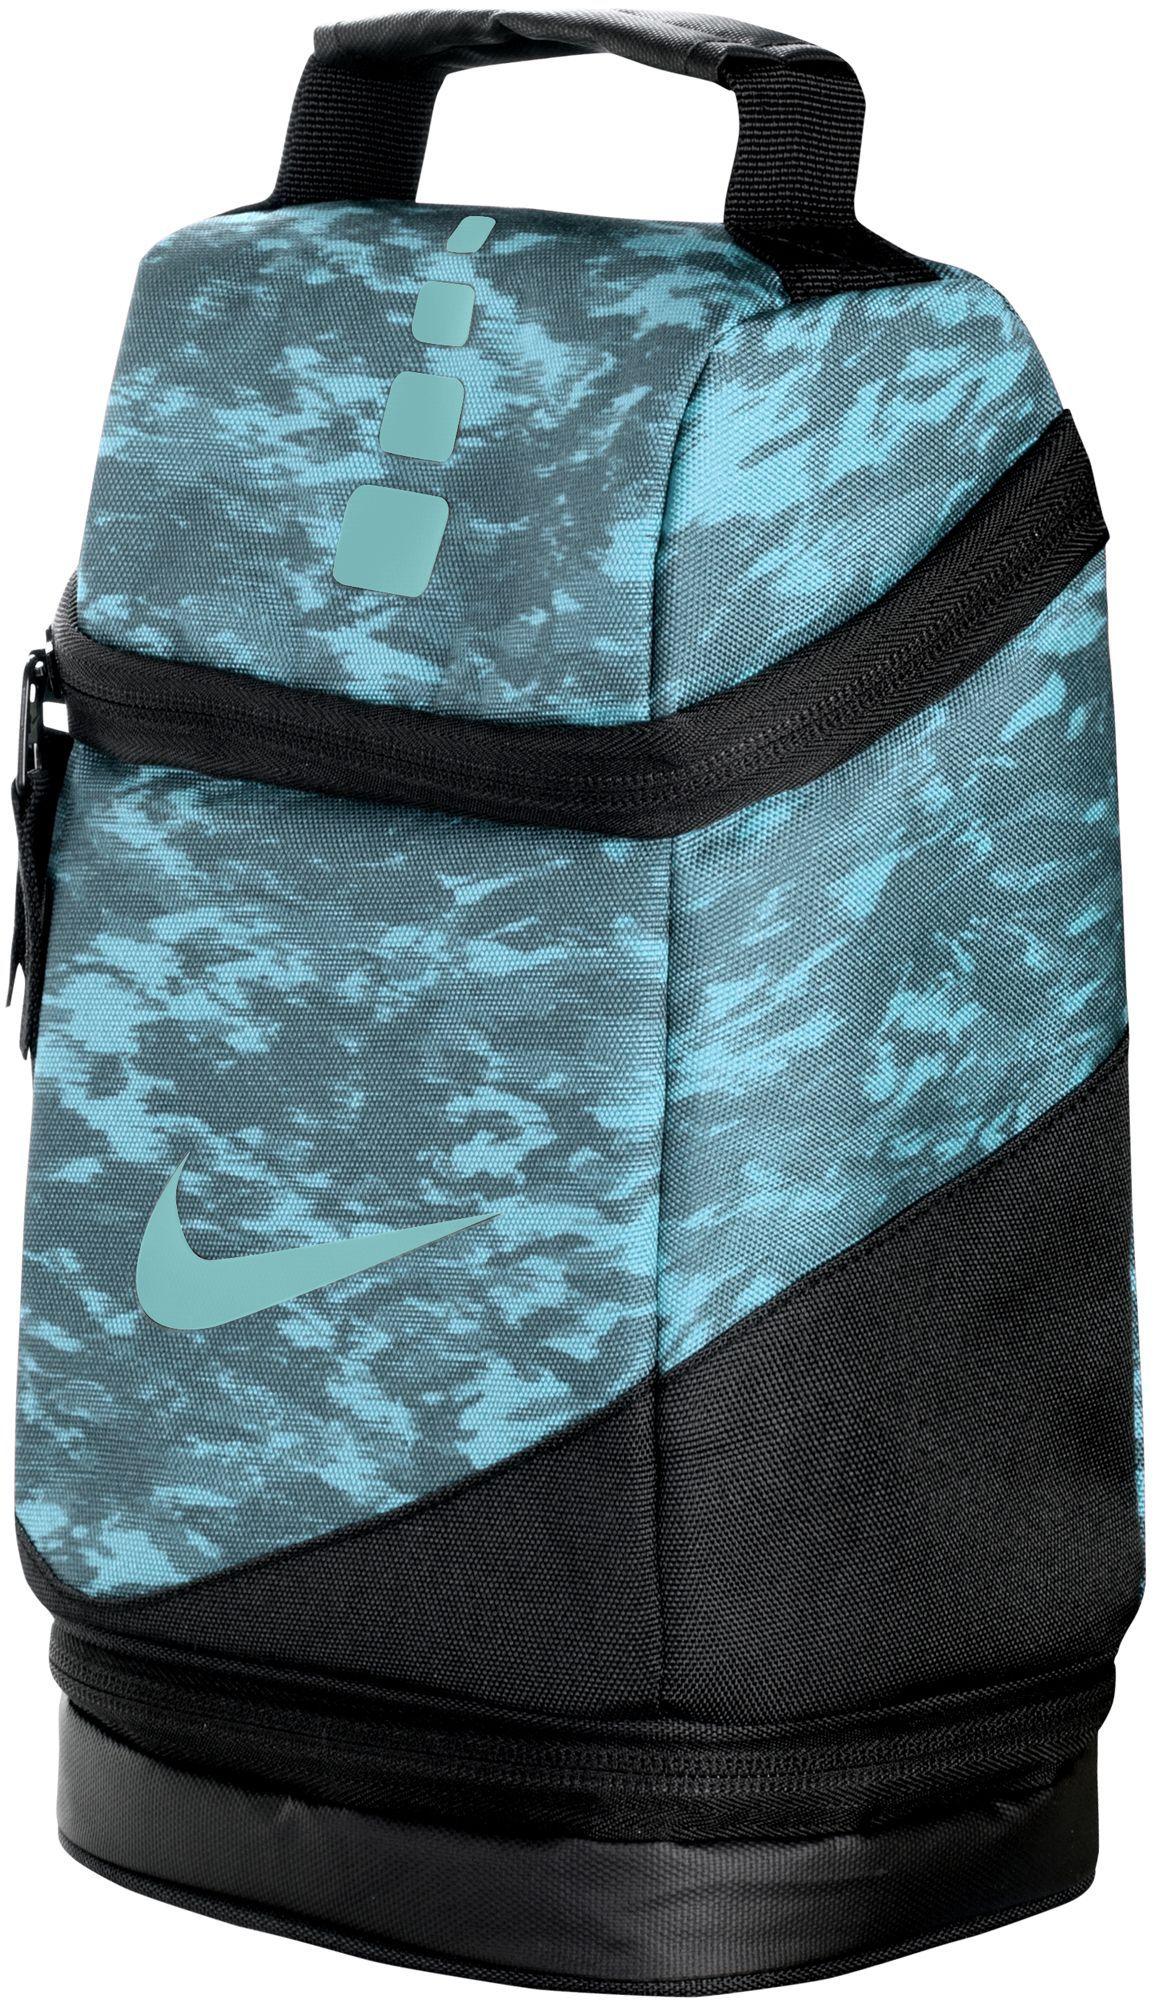 Nike Elite Fuel Pack Lunch Tote Bag 063a2552aea45